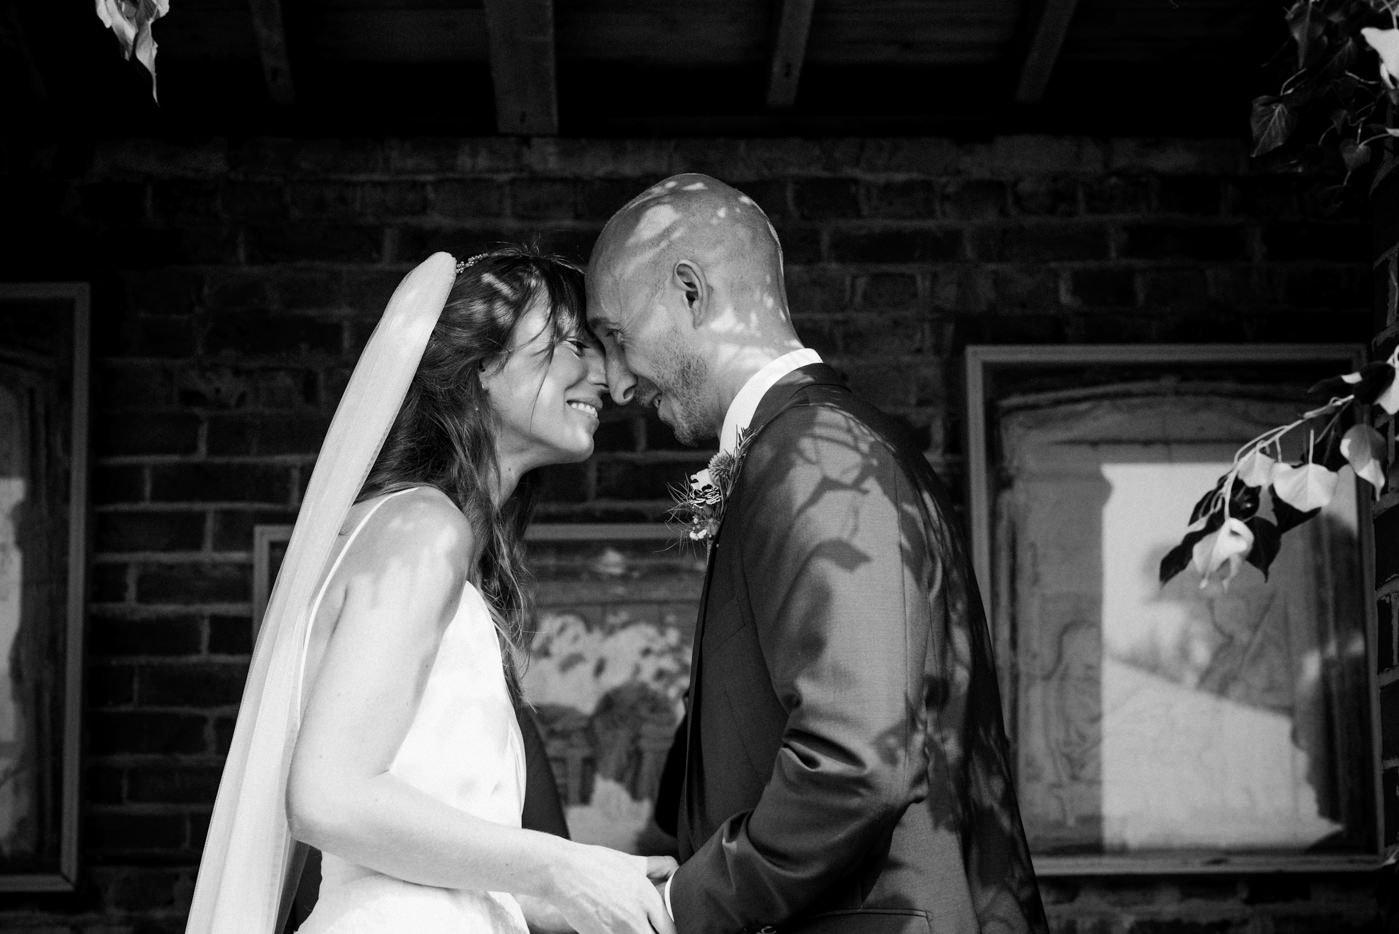 bignor-park-wedding-photography-robyn-and-tom-56